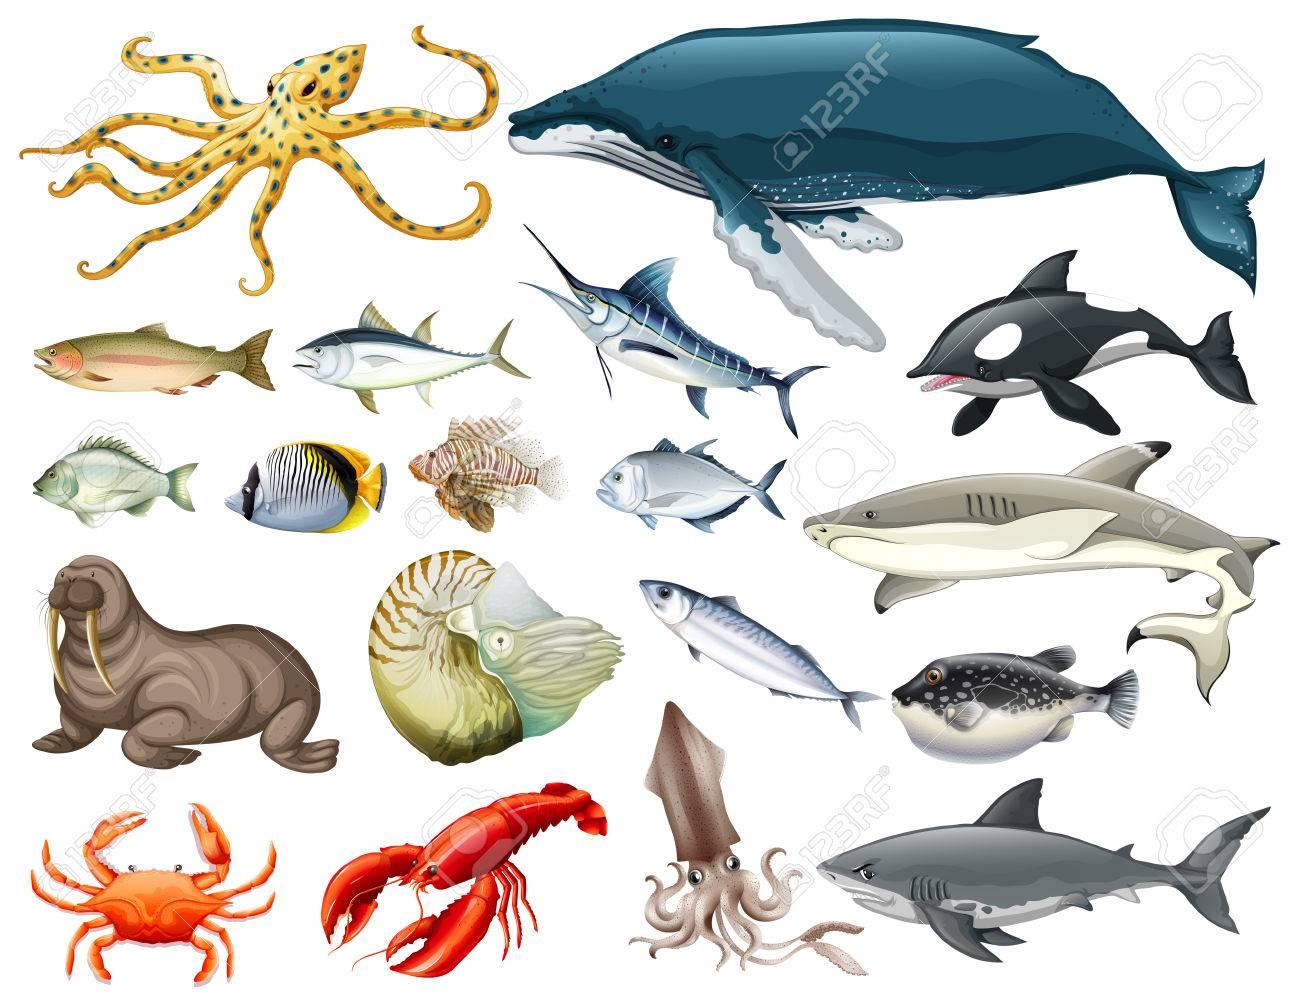 Set of different types of sea animals illustration - 59887153